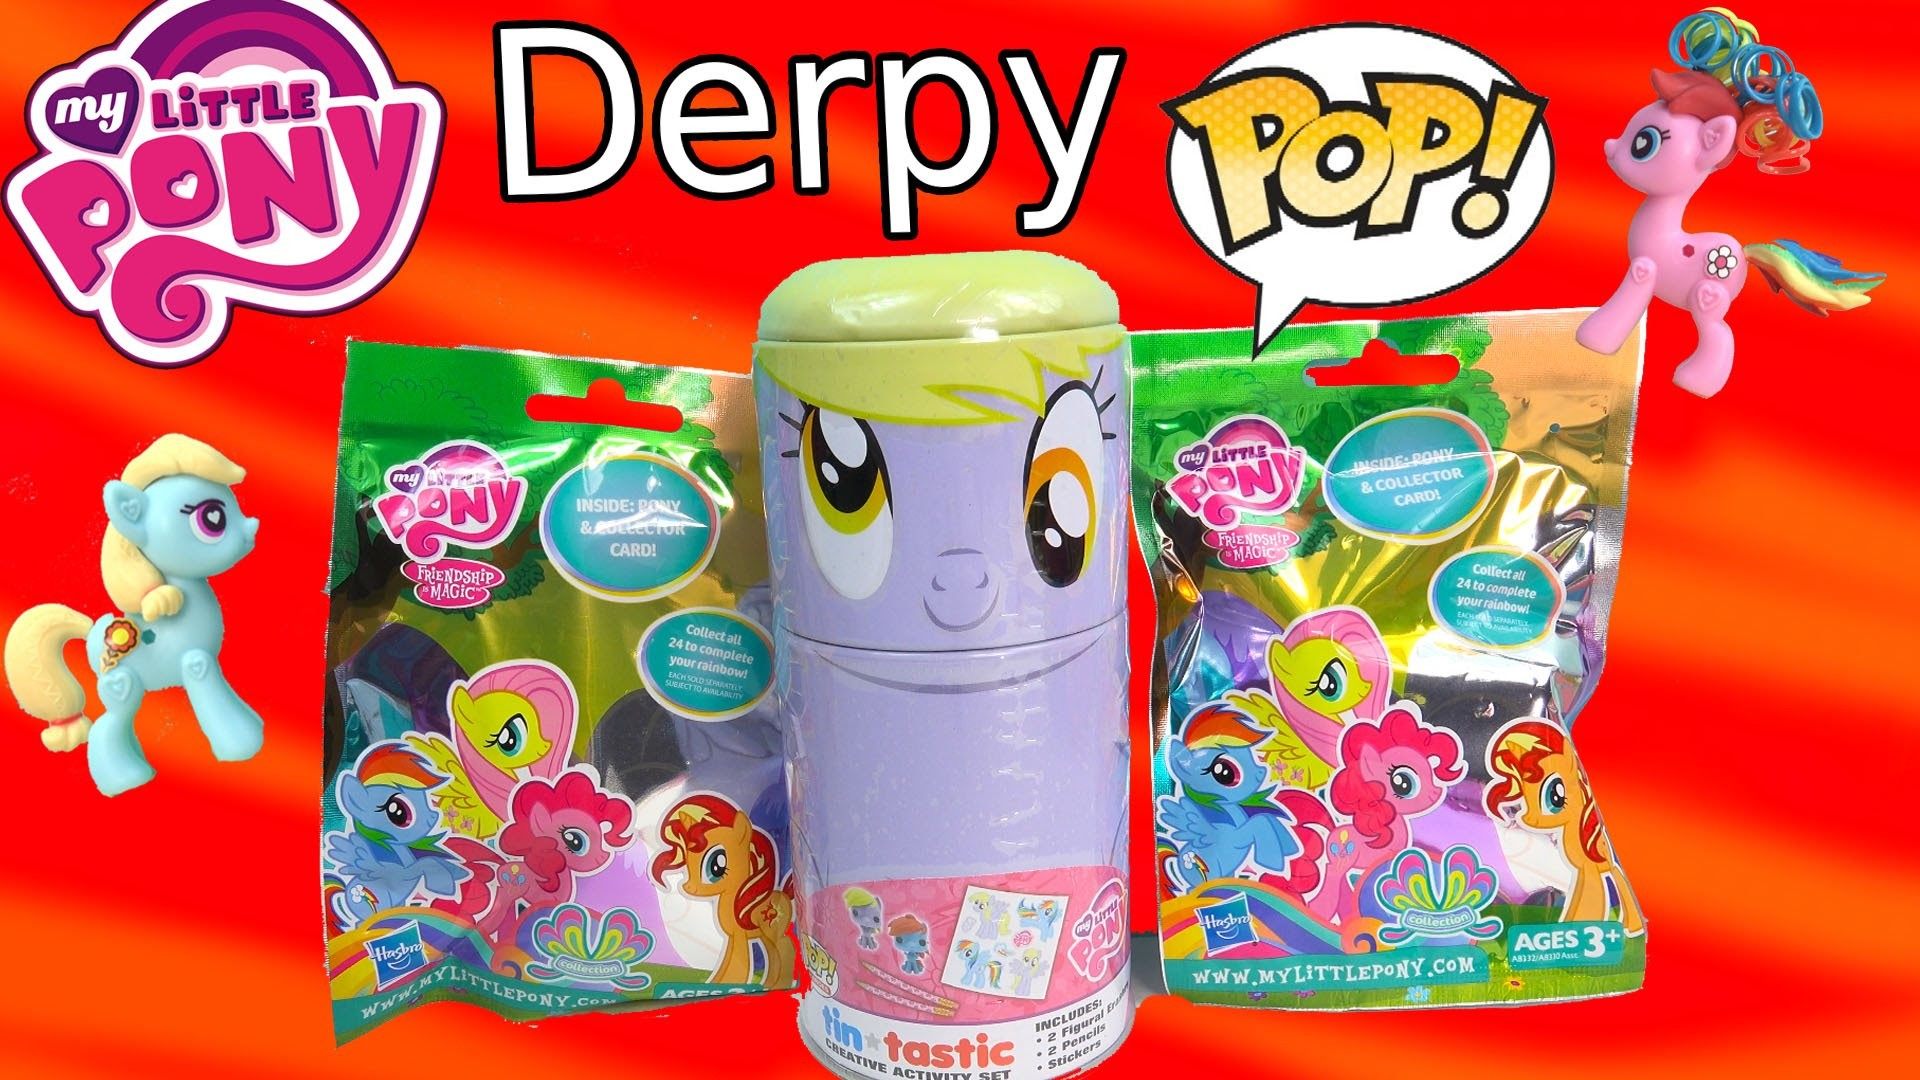 MLP My Little Pony Derpy Hooves Tin-Tastic Funko Pop Vinyl Blind Bags Figures Happy Cookieswirlc